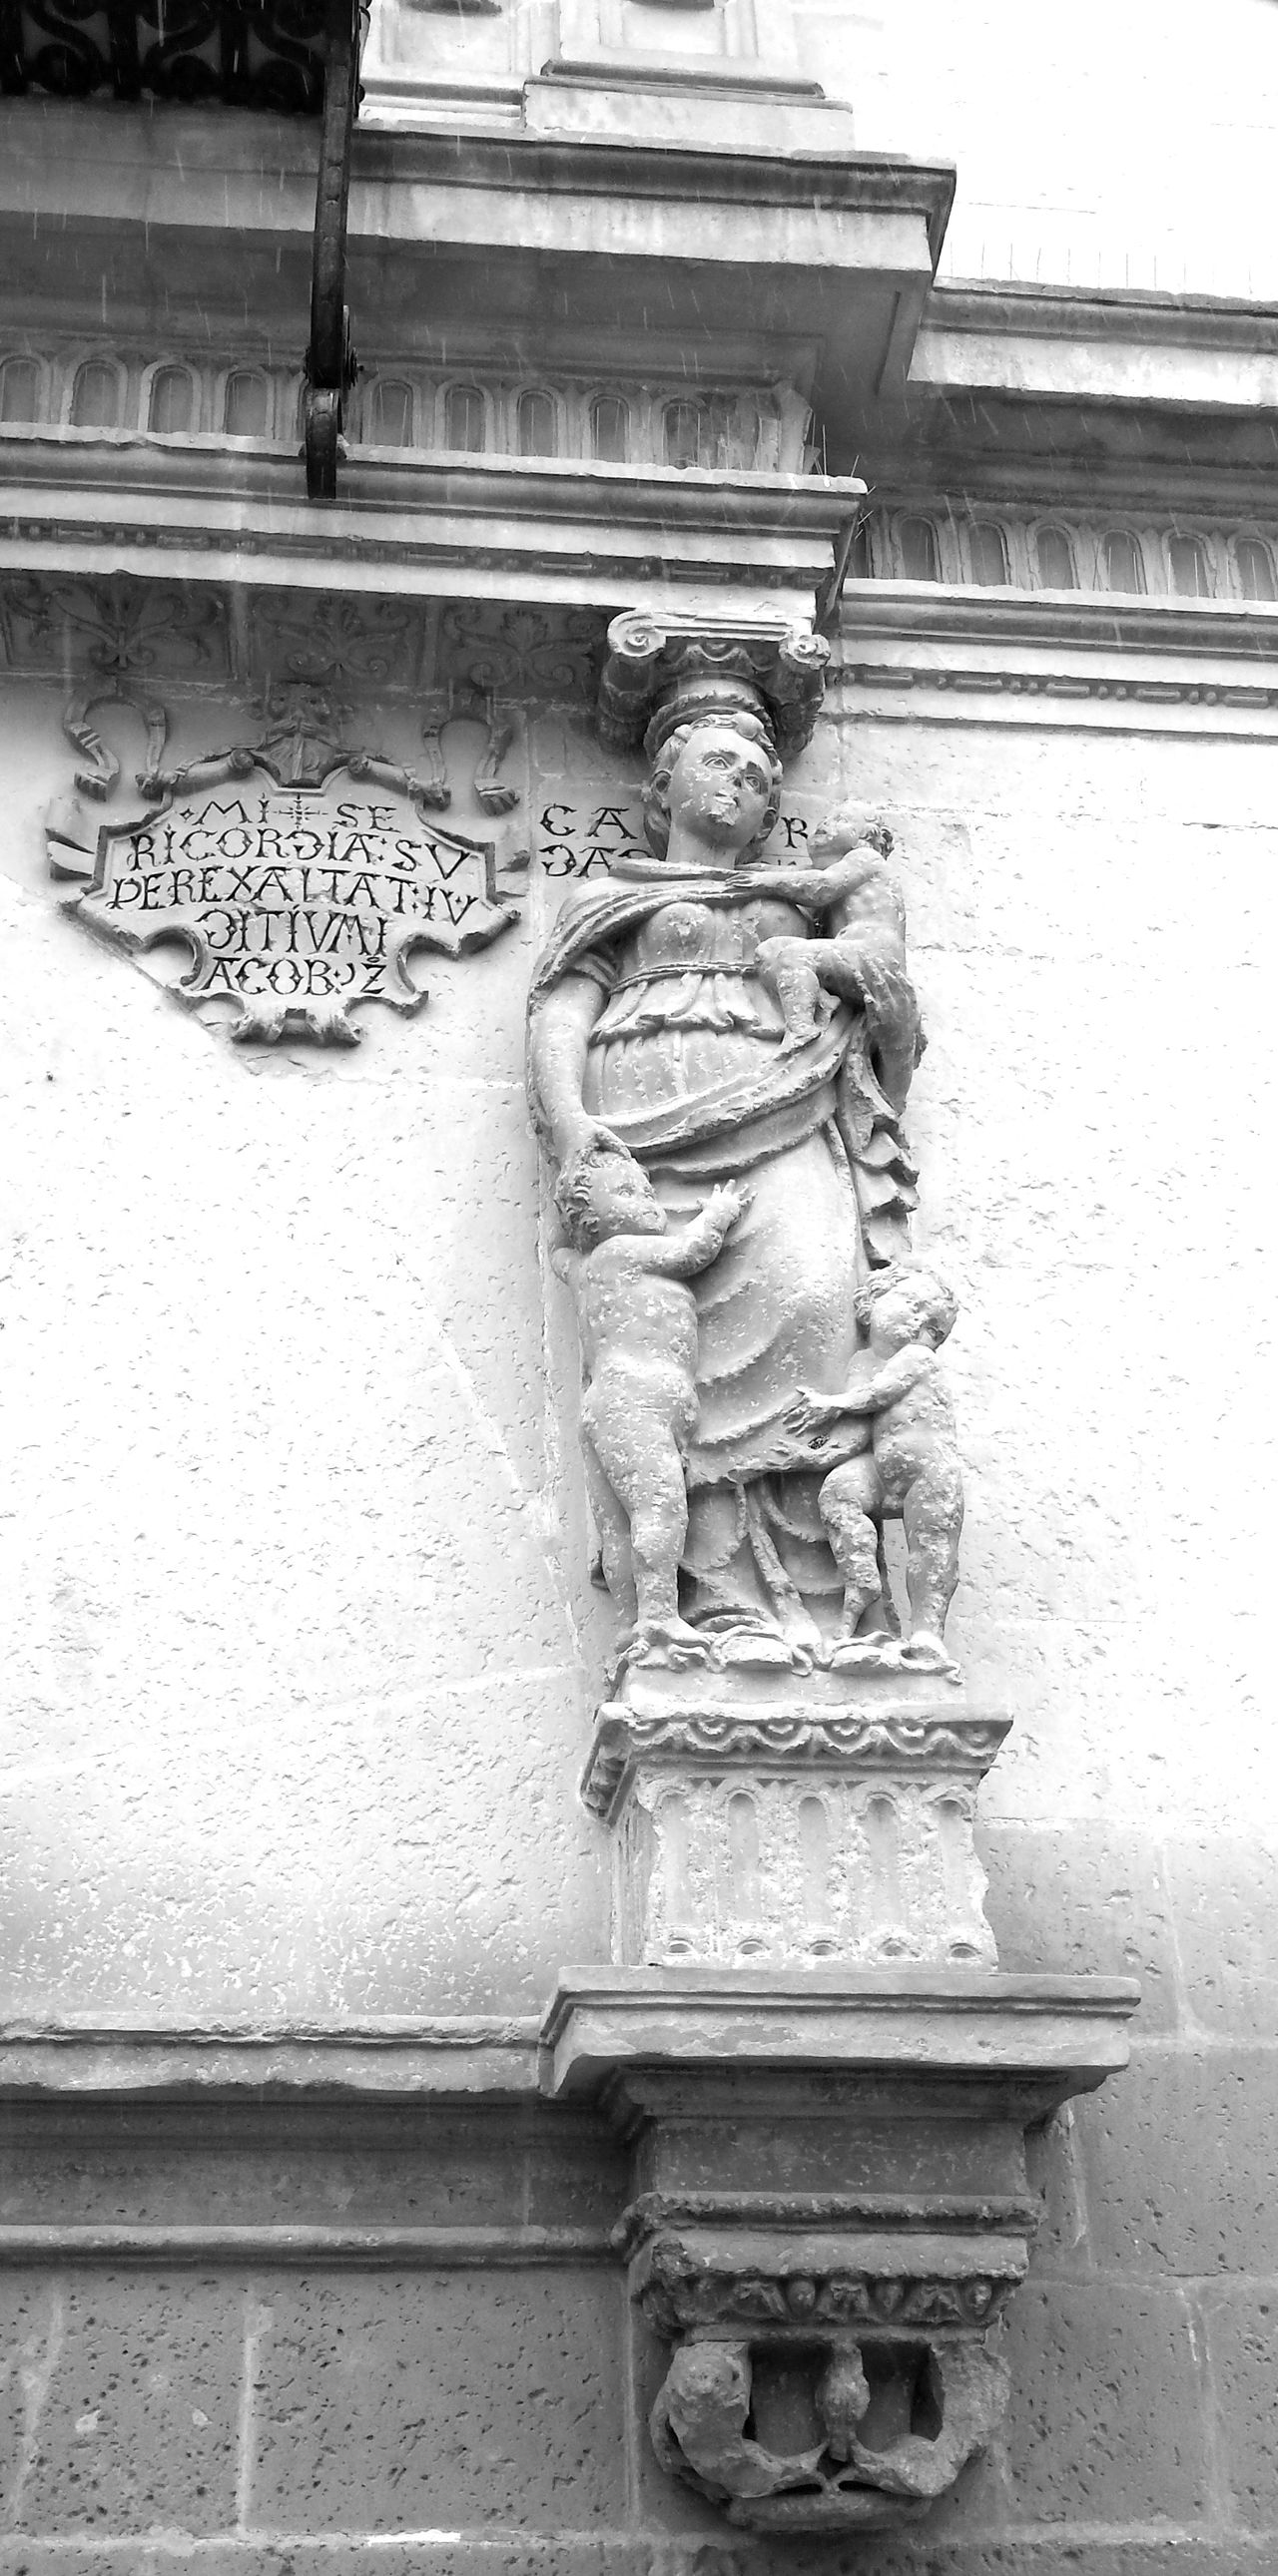 Human Representation Statue Sculpture No People Day Outdoors Baeza ❤ Baeza Ubeda Baeza Renacimiento Renacimiento Giennense Renacimiento Español La Loma Jaén